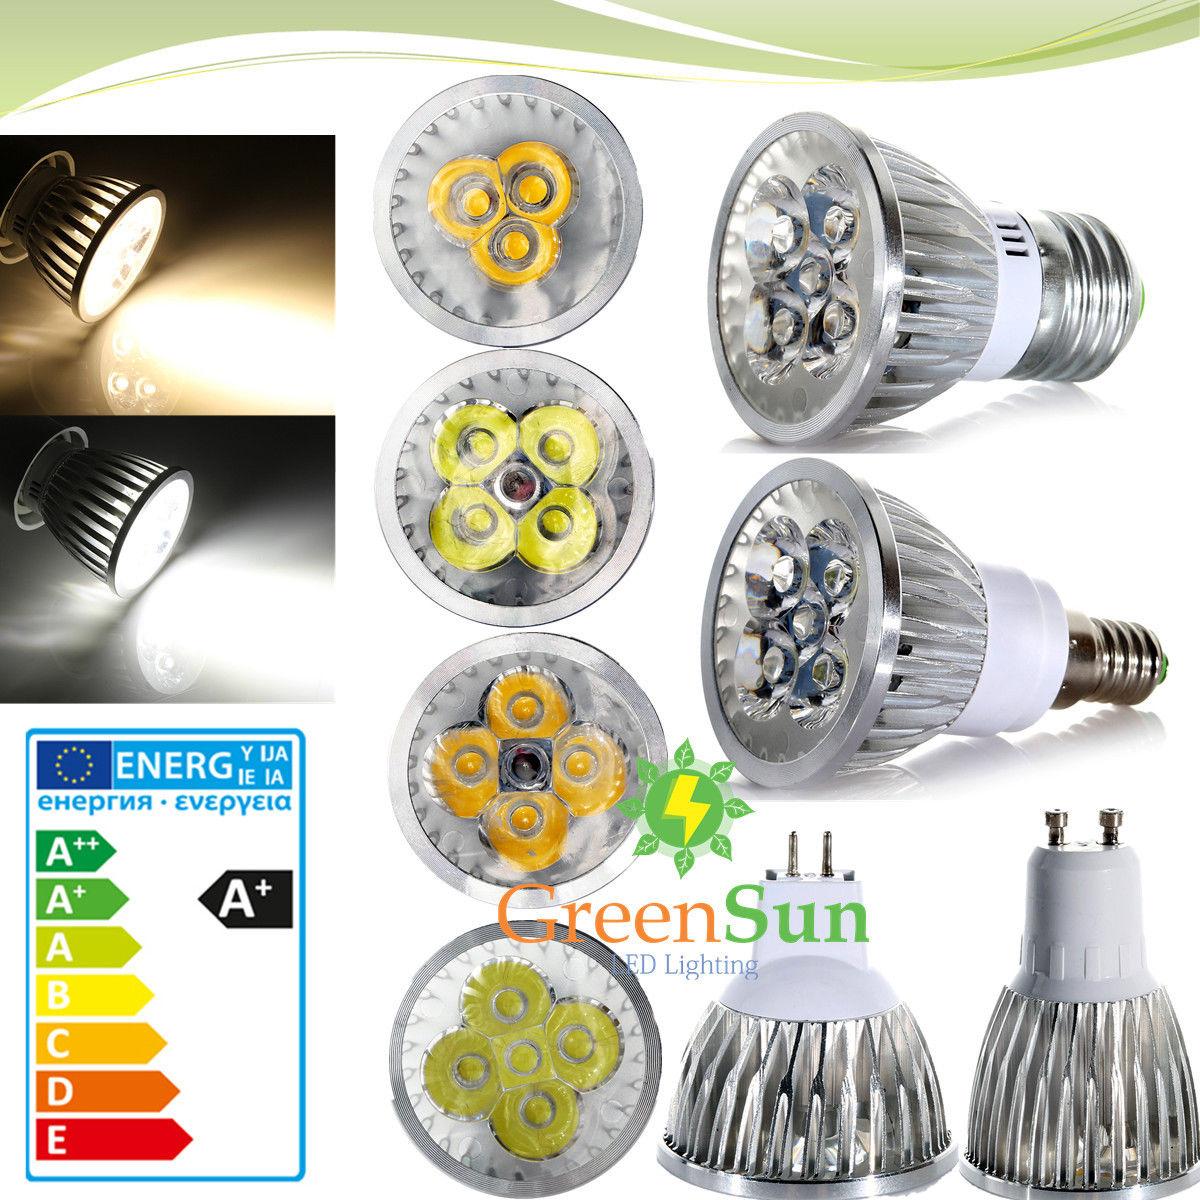 MR16 GU10 E27 E14 3W 4W 5W LED Spot Spotlight Light Lamp Bulb Warm/Cool white mr beams светильник mr beams spotlight led на батареях с сенсорами корпус белый